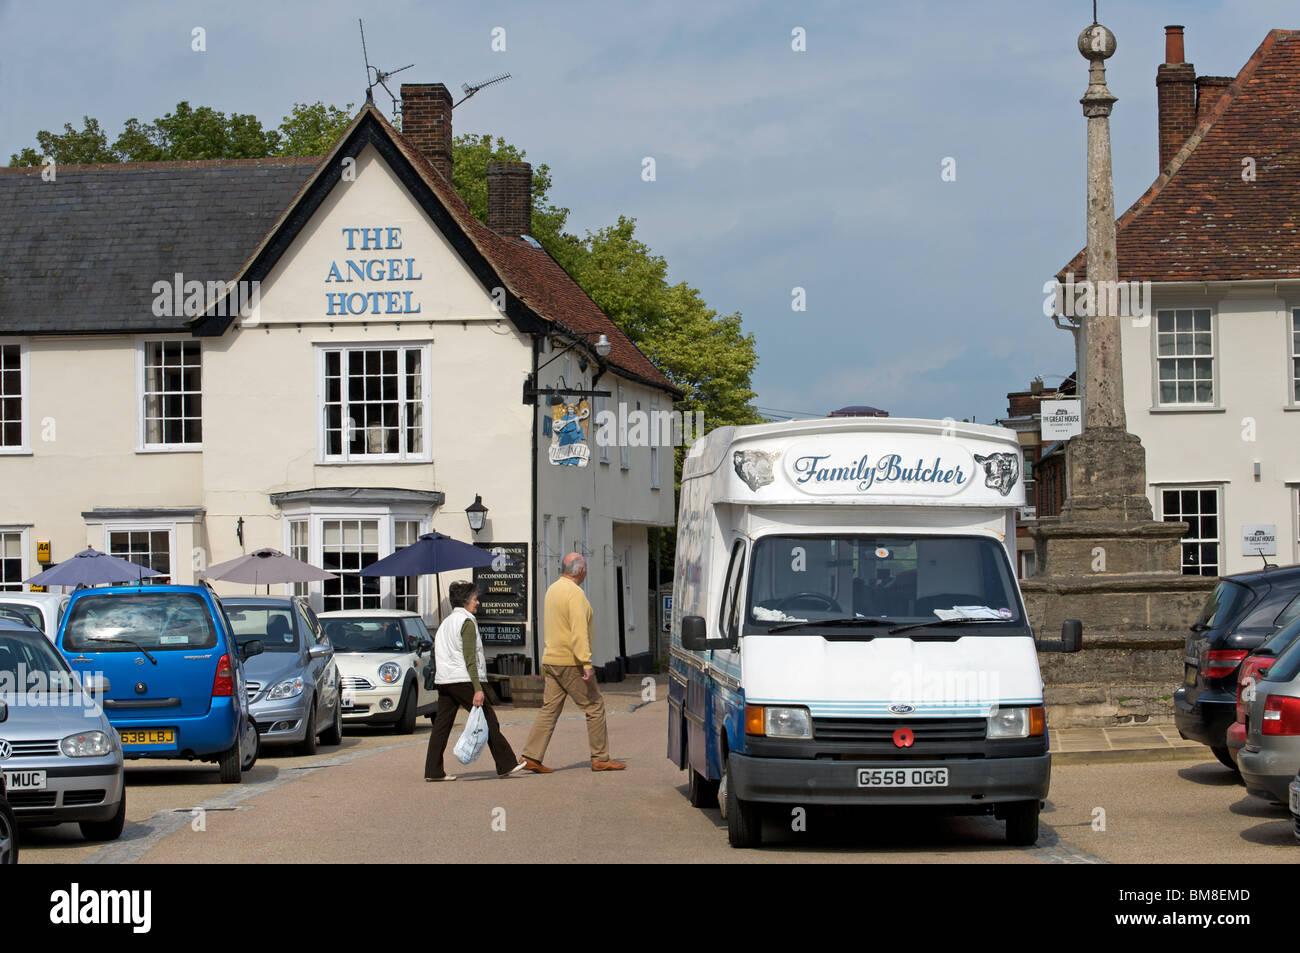 Market Square, Lavenham, Suffolk, UK. - Stock Image